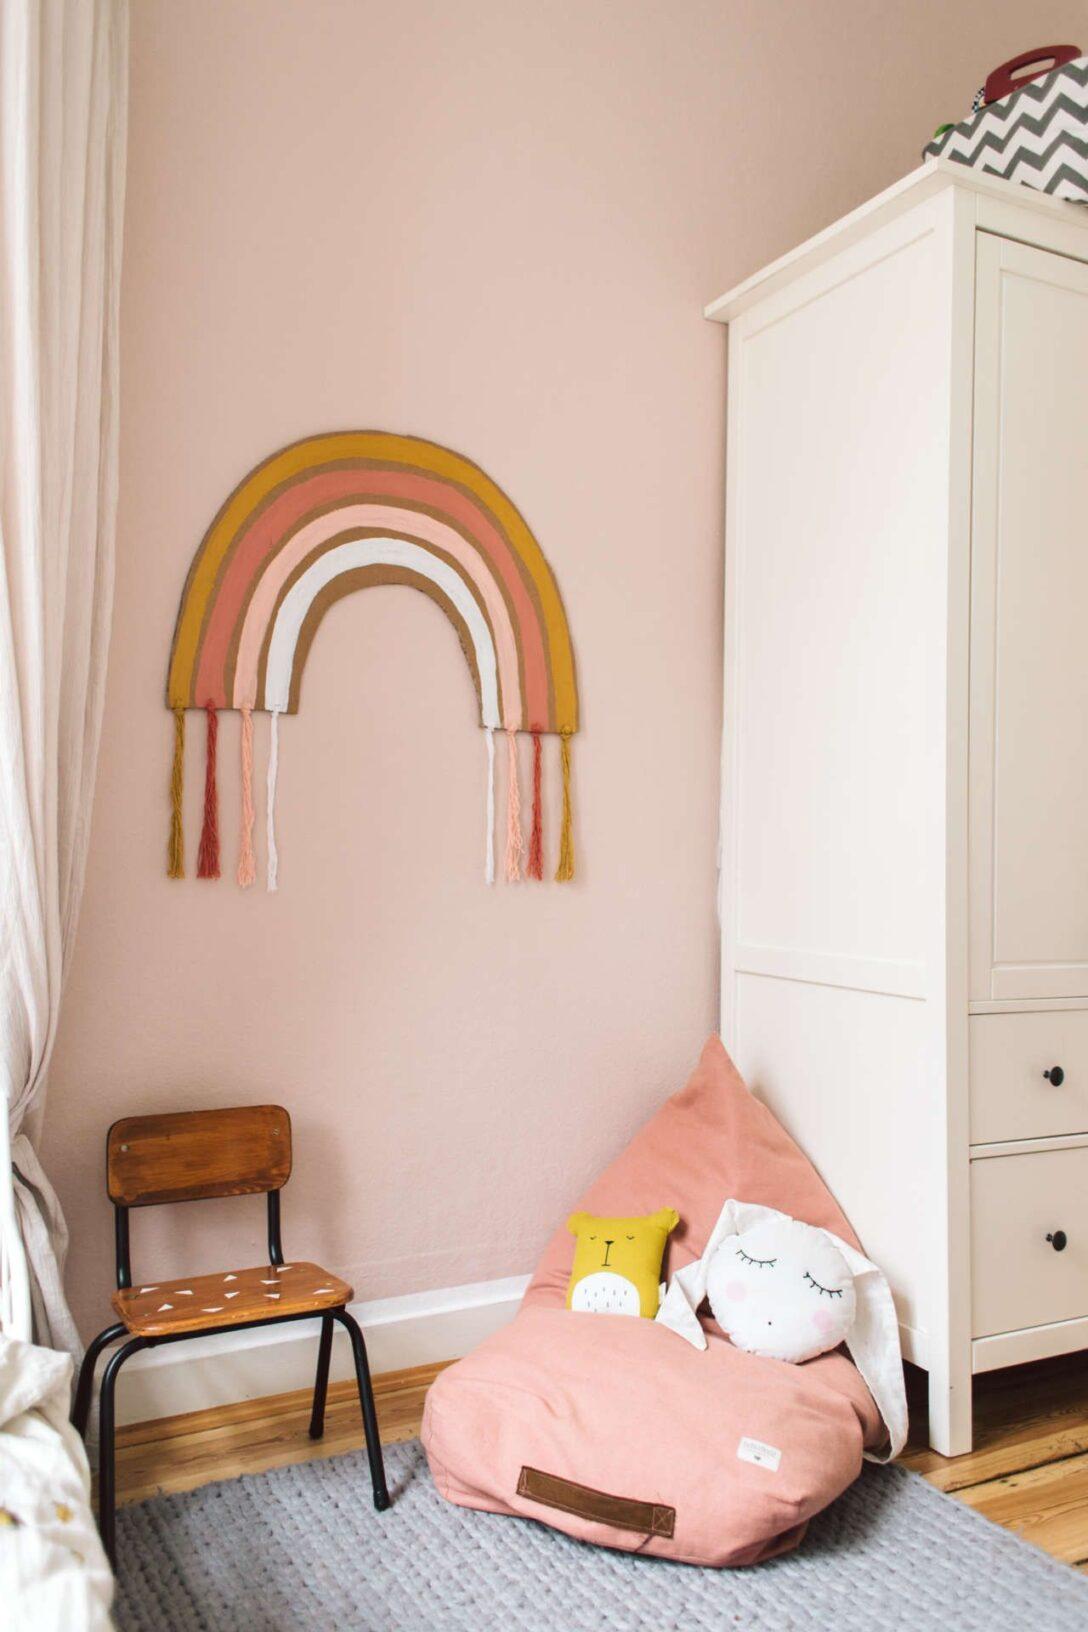 Large Size of Kinderzimmer Wanddeko Diy Regenbogen Selber Machen Regal Weiß Regale Sofa Küche Kinderzimmer Kinderzimmer Wanddeko